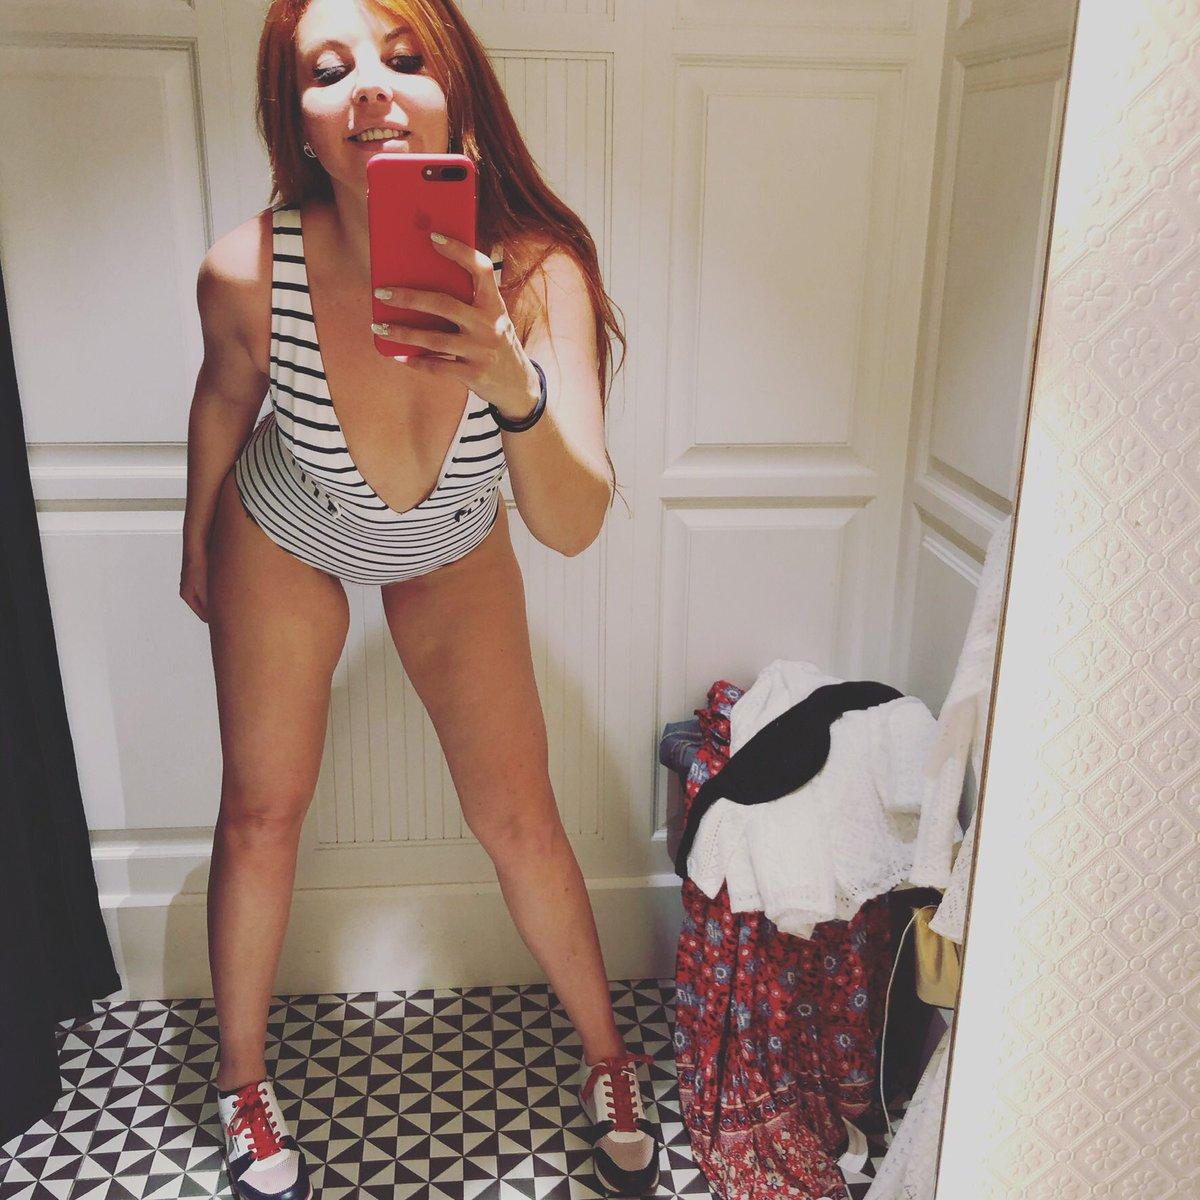 test Twitter Media - Operación bikini... noooo😱😱😱 Lo mío será operación burkini😂😂😂 https://t.co/kSdp4LE8sO